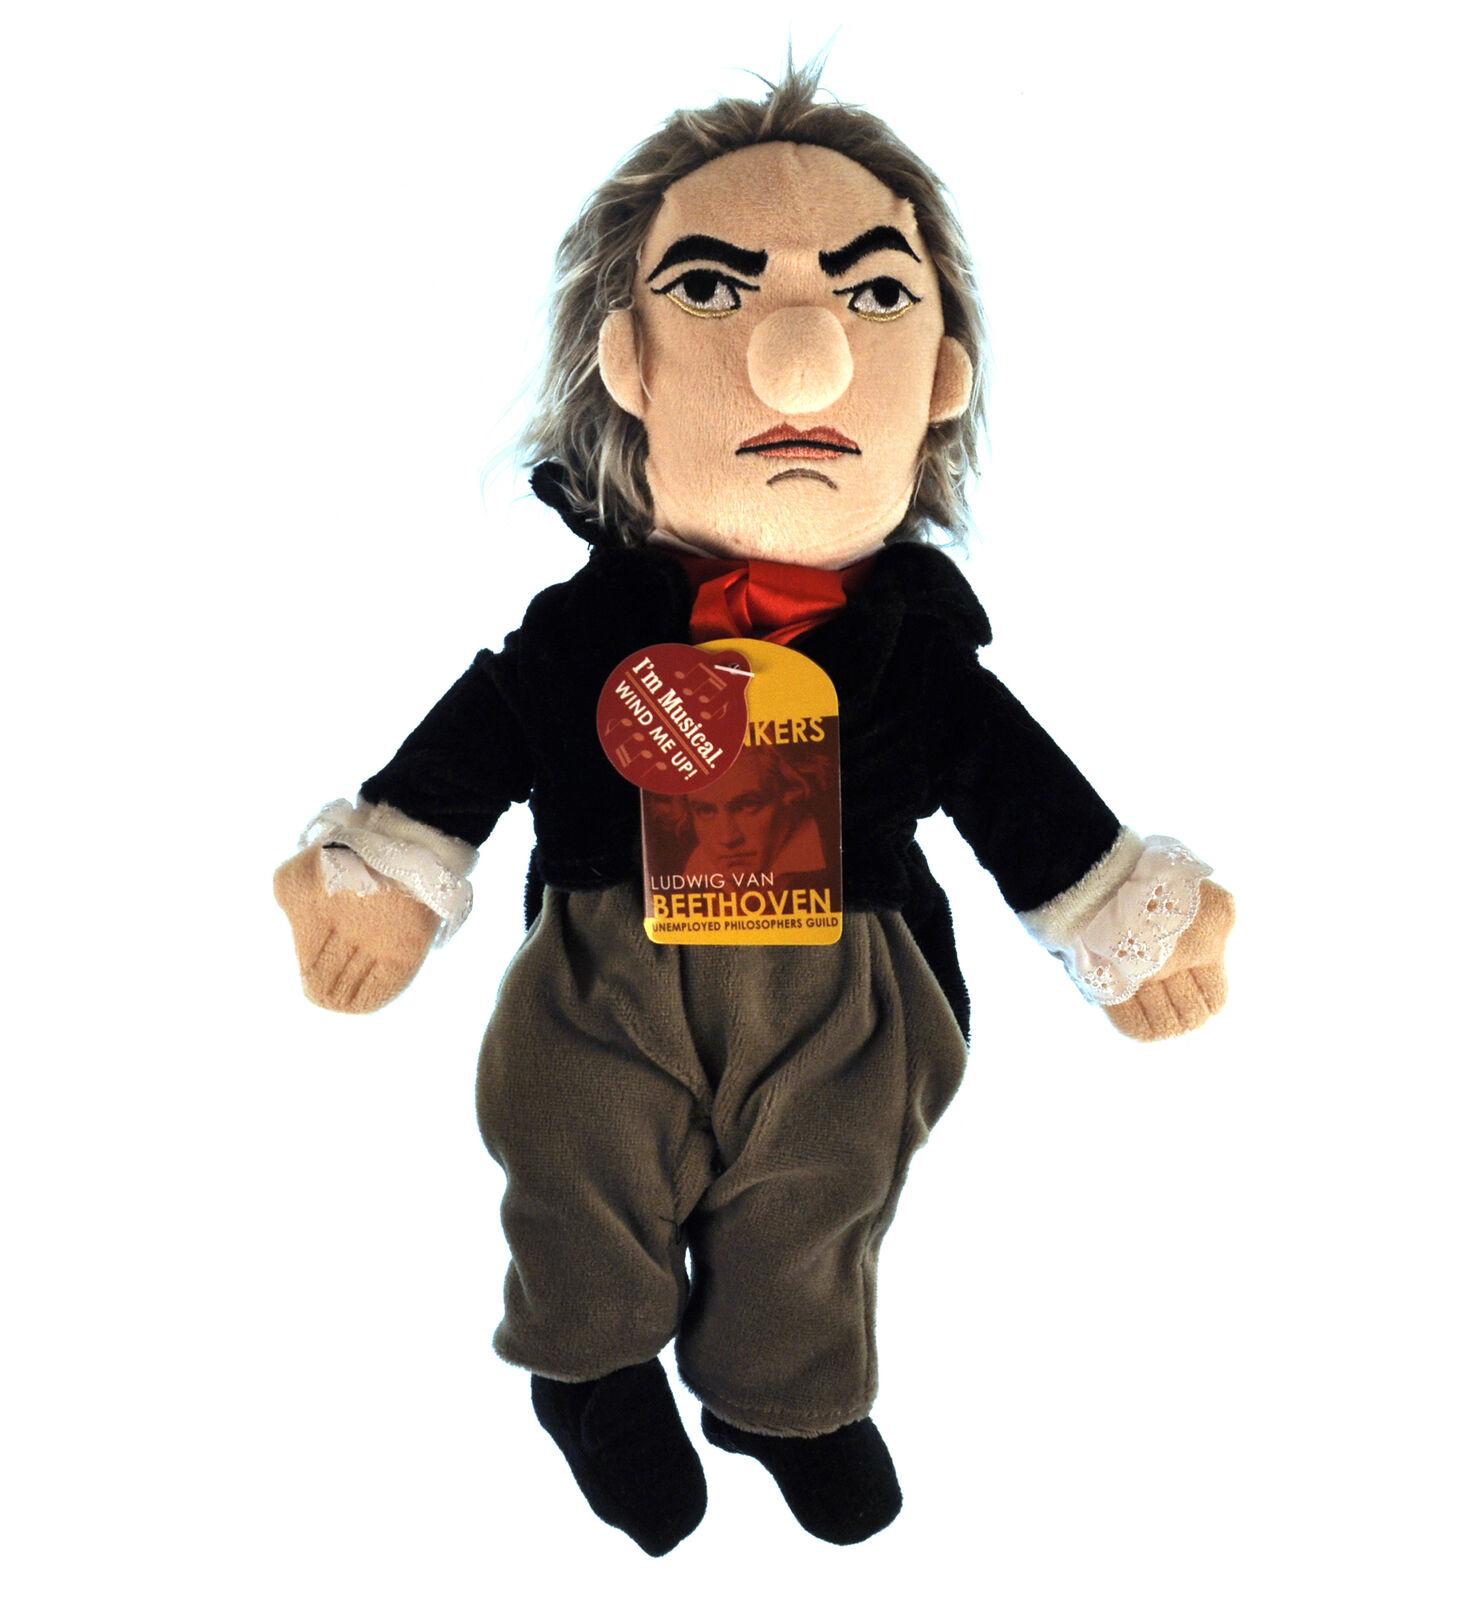 Beethoven Plüschtier - Little Denker Puppe - Spielt Musik